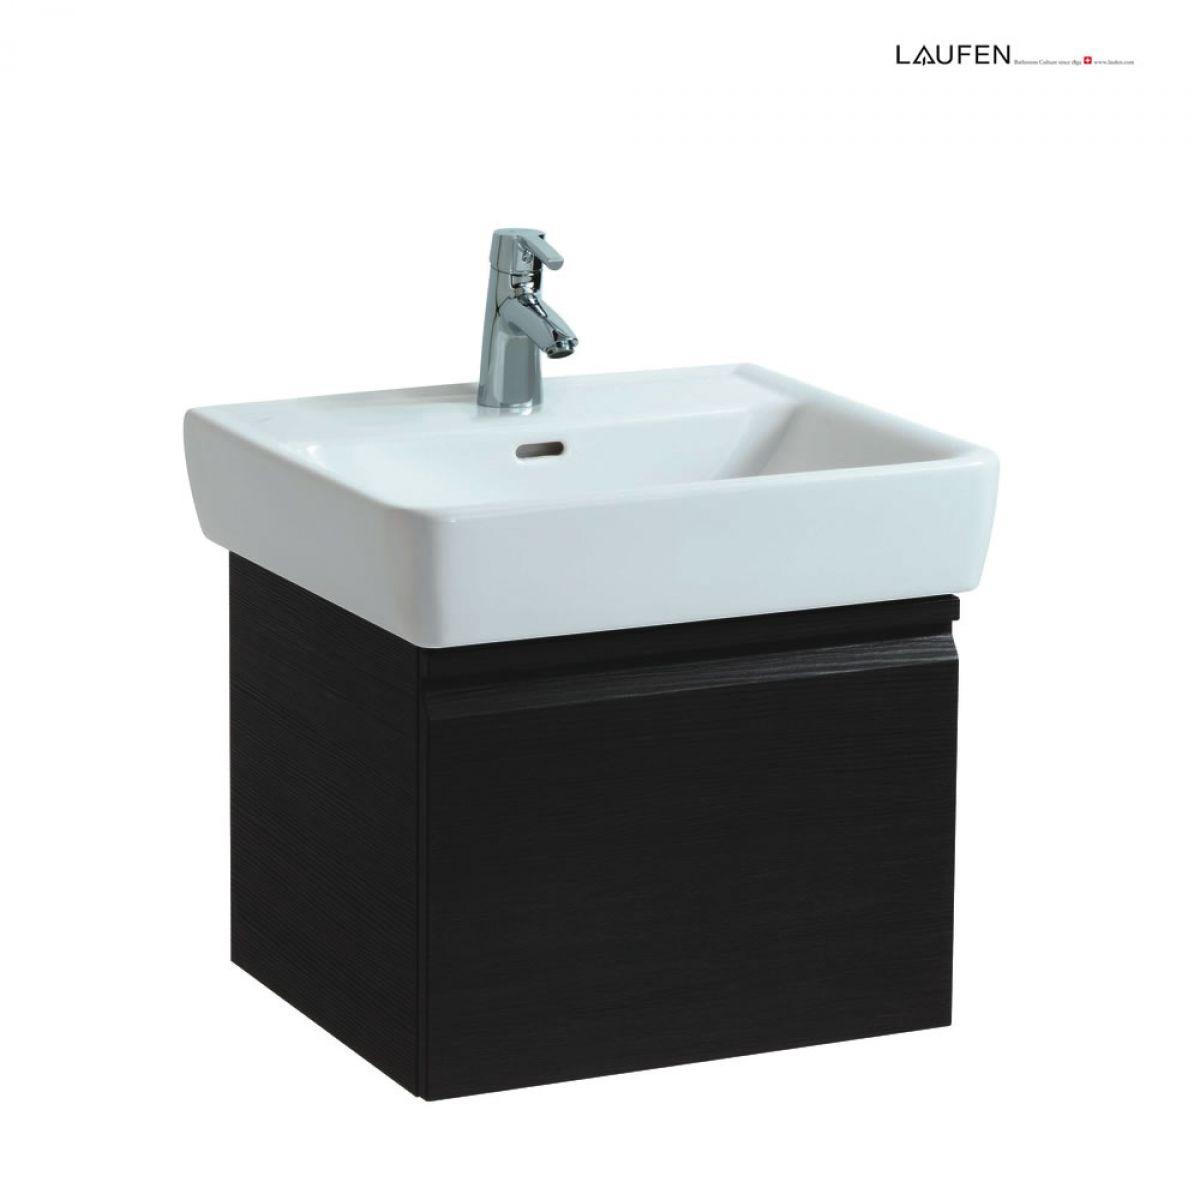 laufen pro 47cm vanity unit with basin uk bathrooms. Black Bedroom Furniture Sets. Home Design Ideas